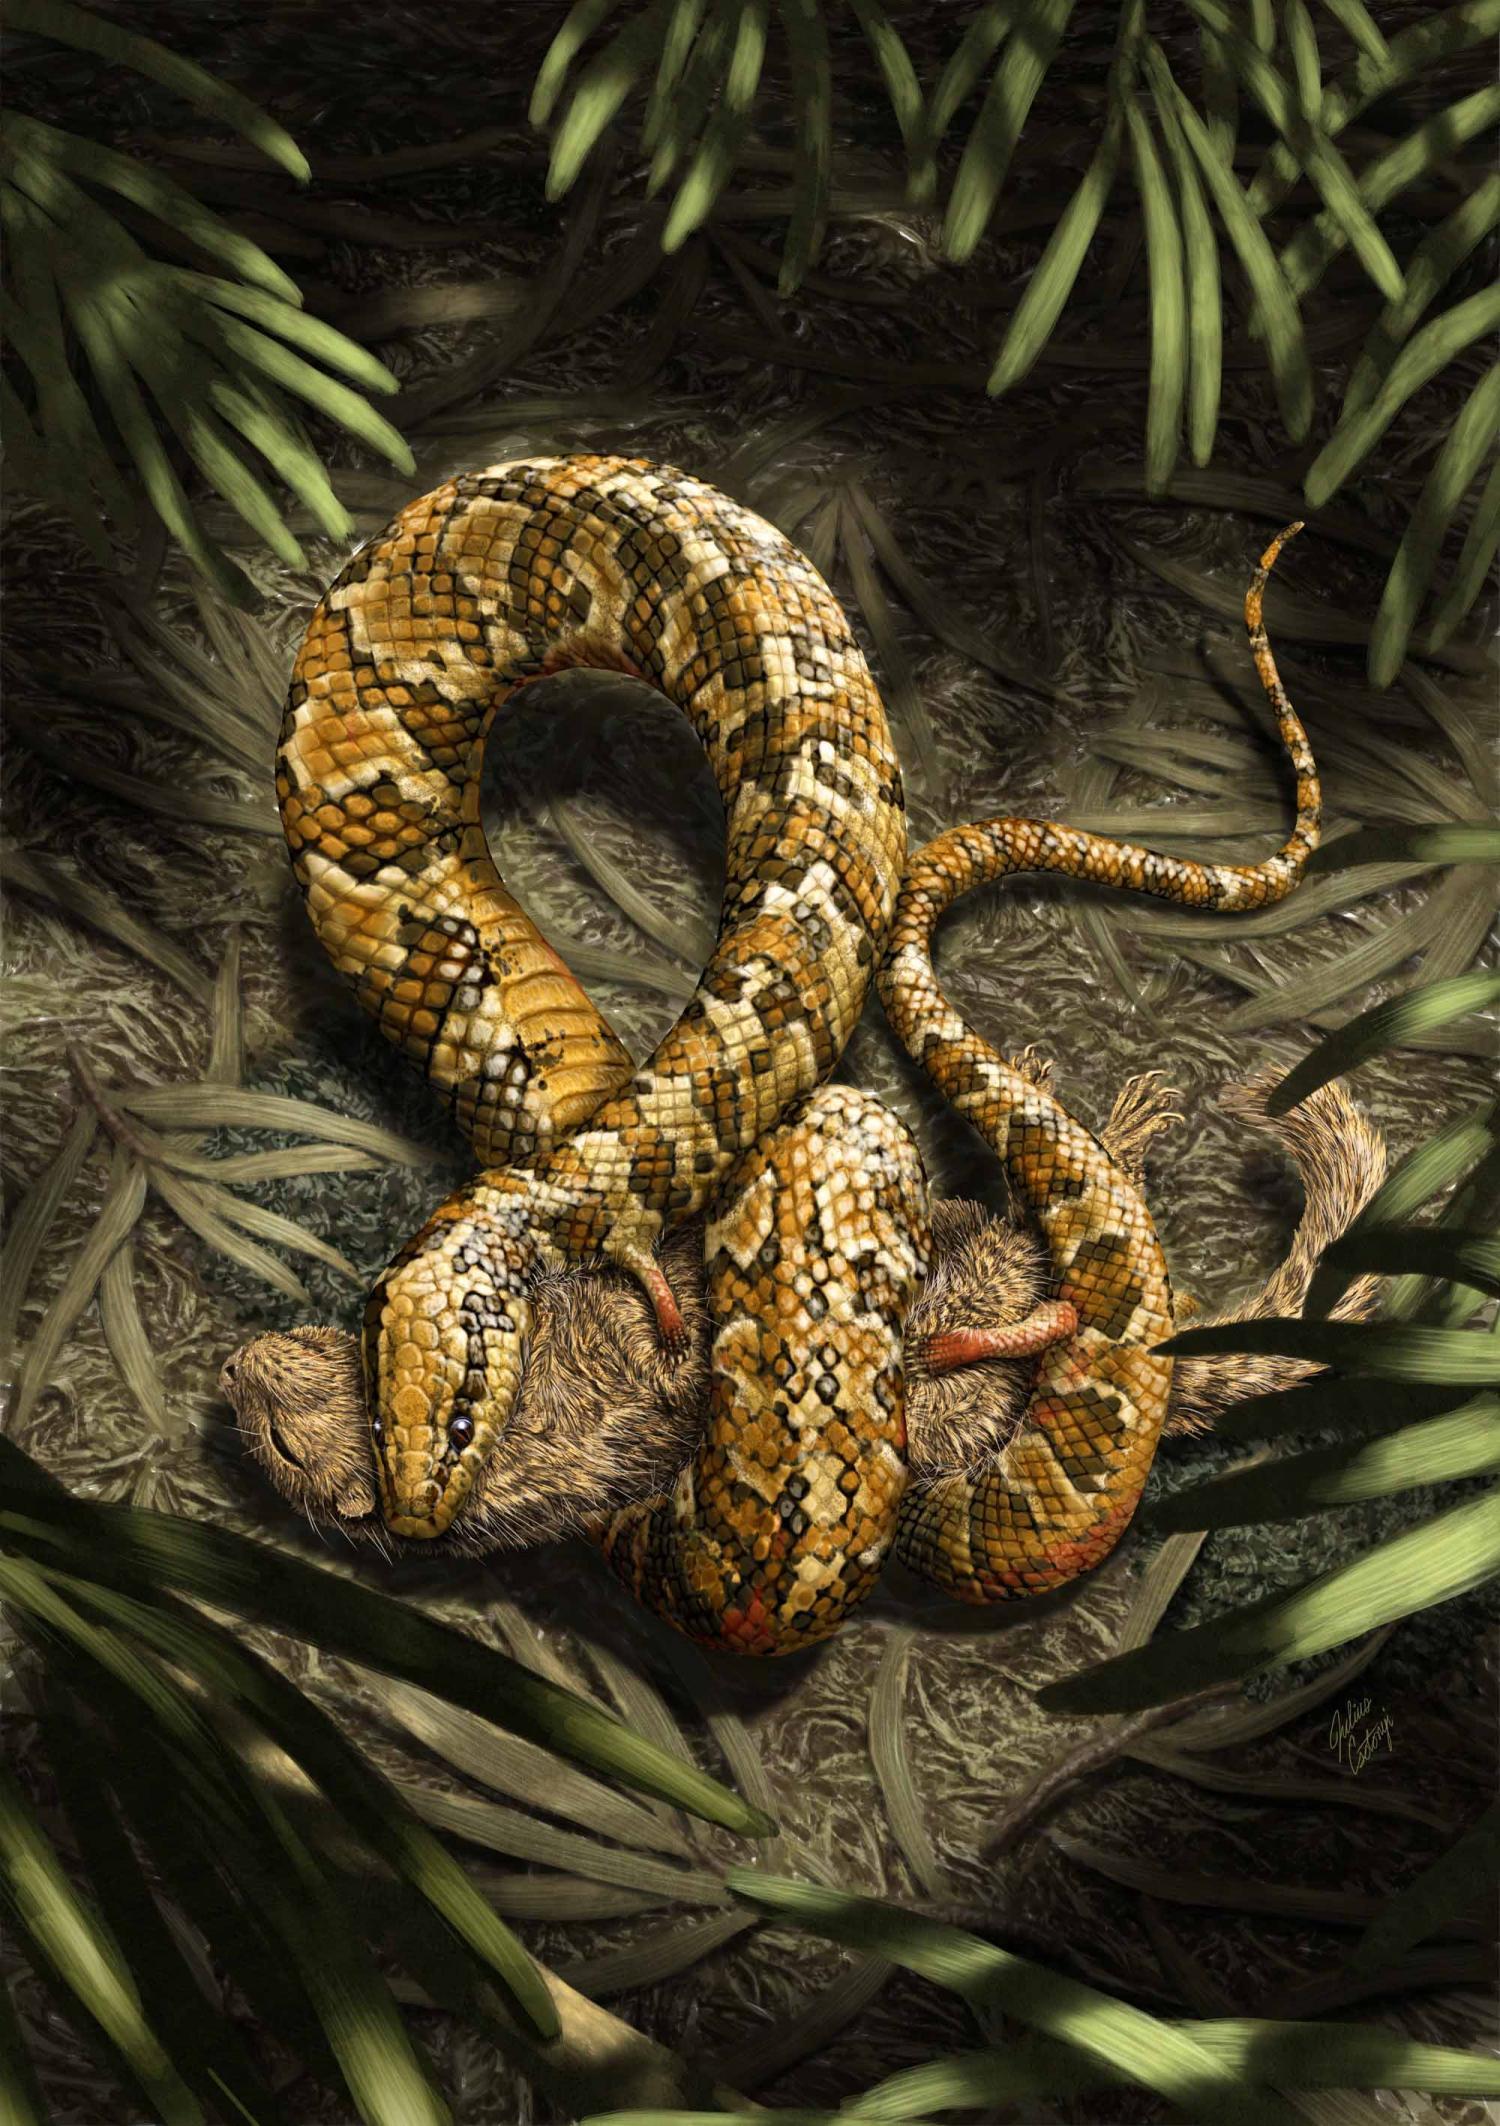 Organic serpent cell photo